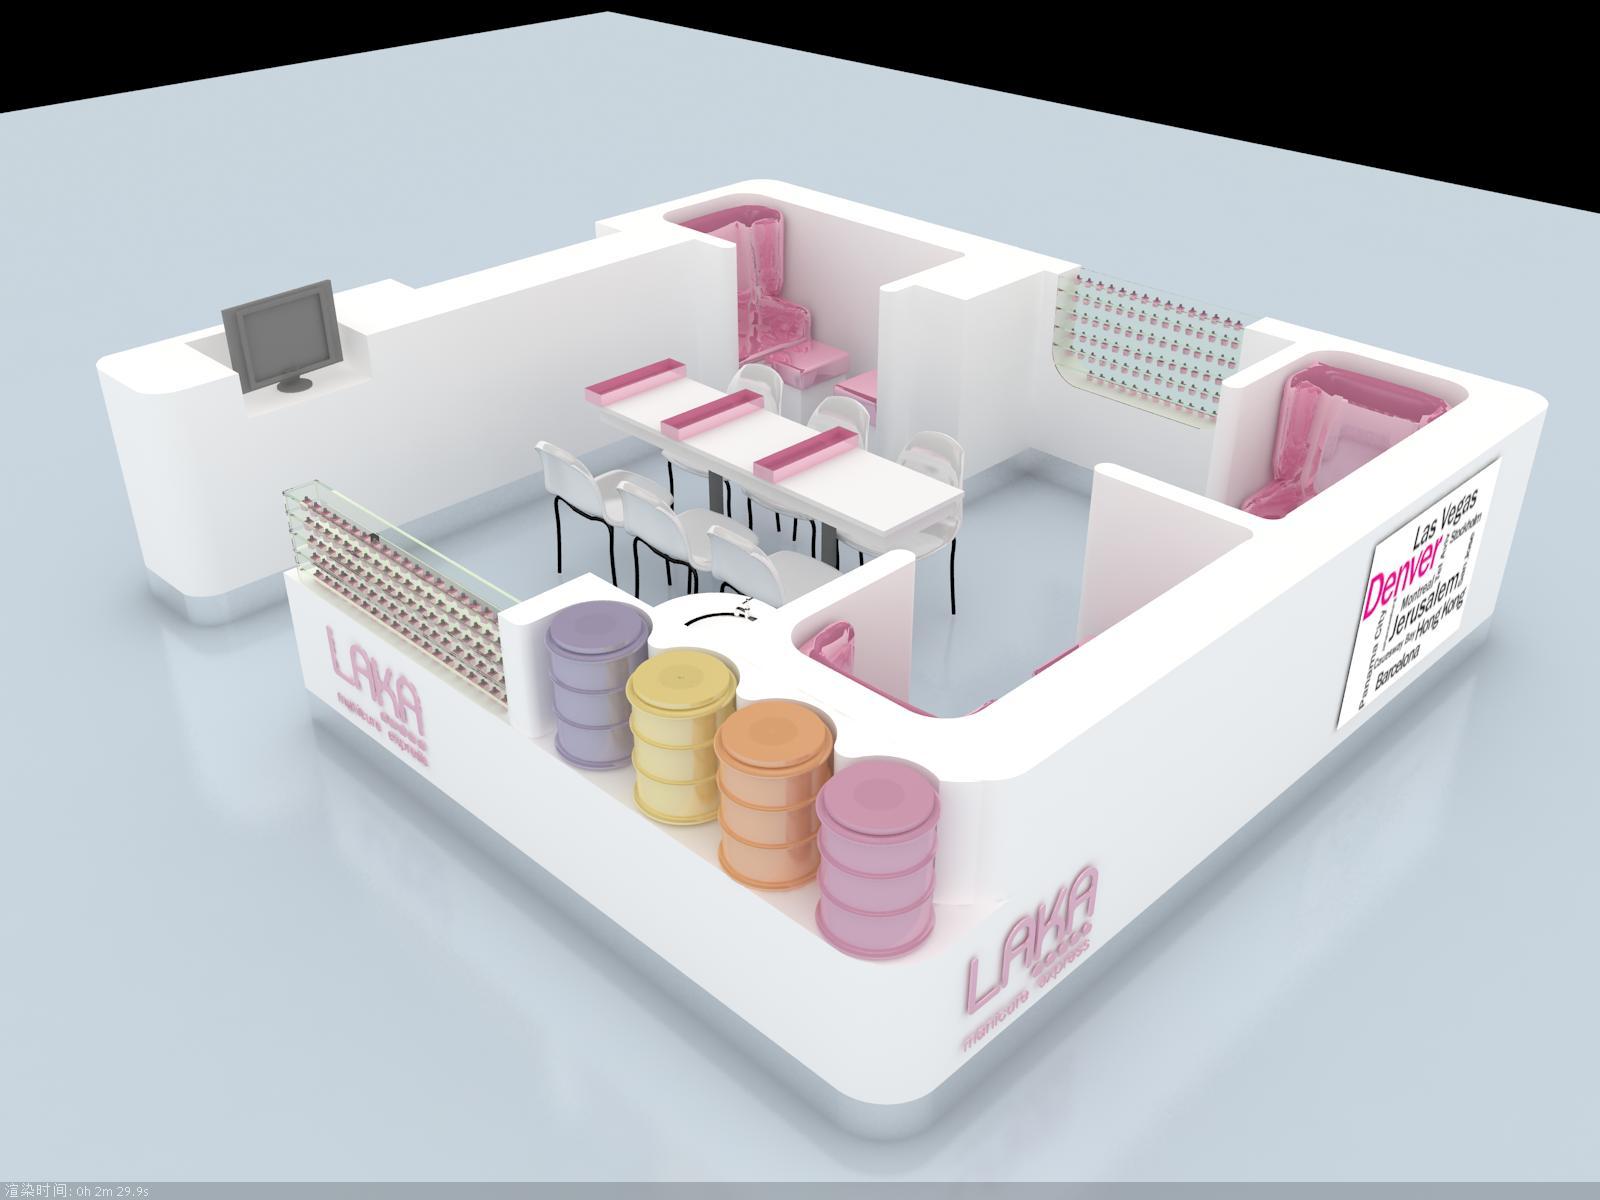 laka kiosk design